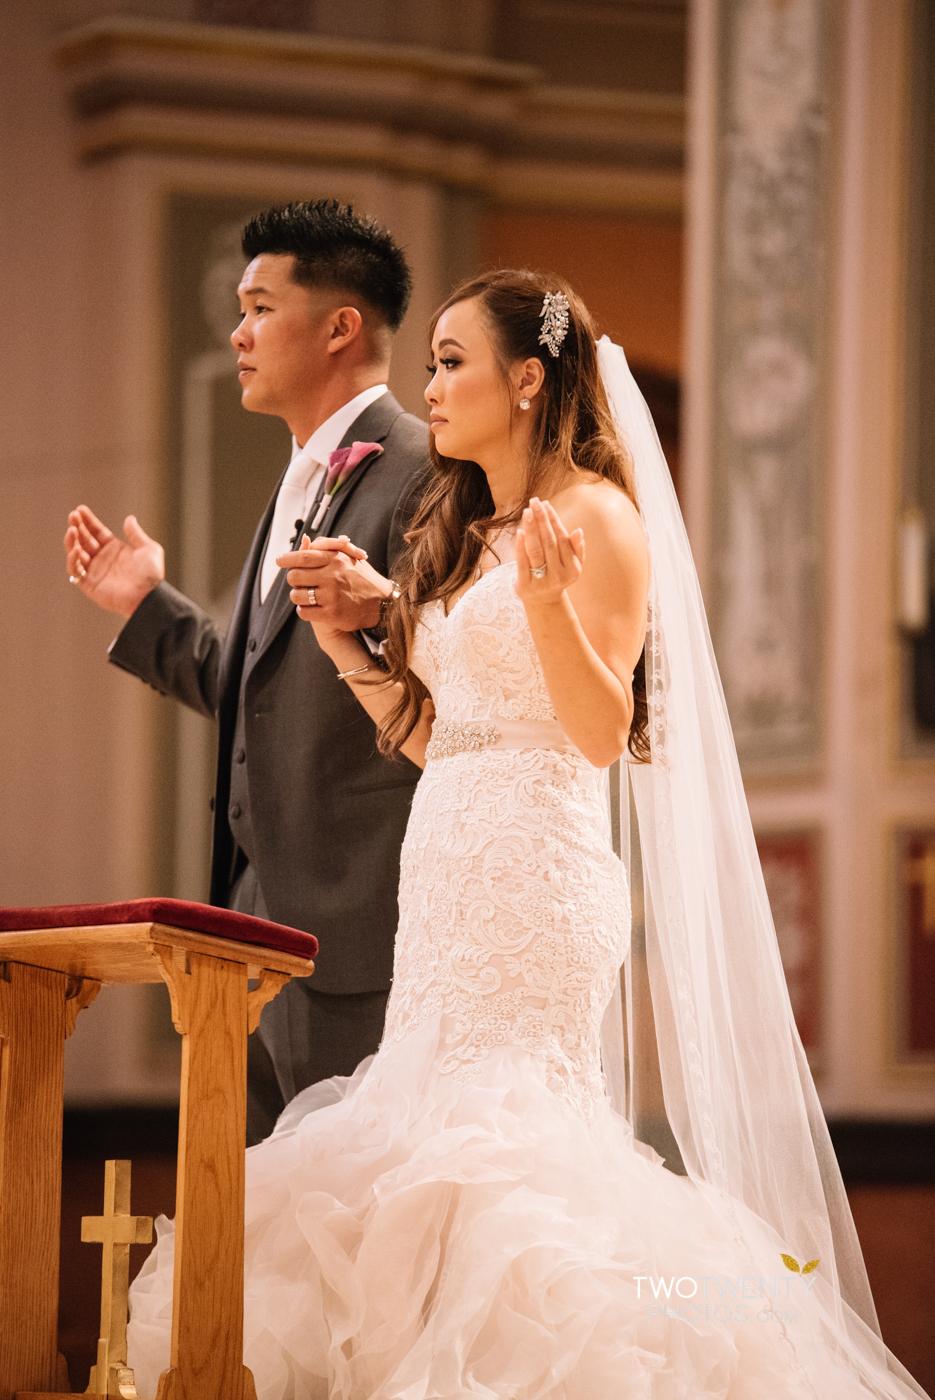 cathedral-of-the-sacred-sacrament-downtown-sacramento-wedding-photographer-24